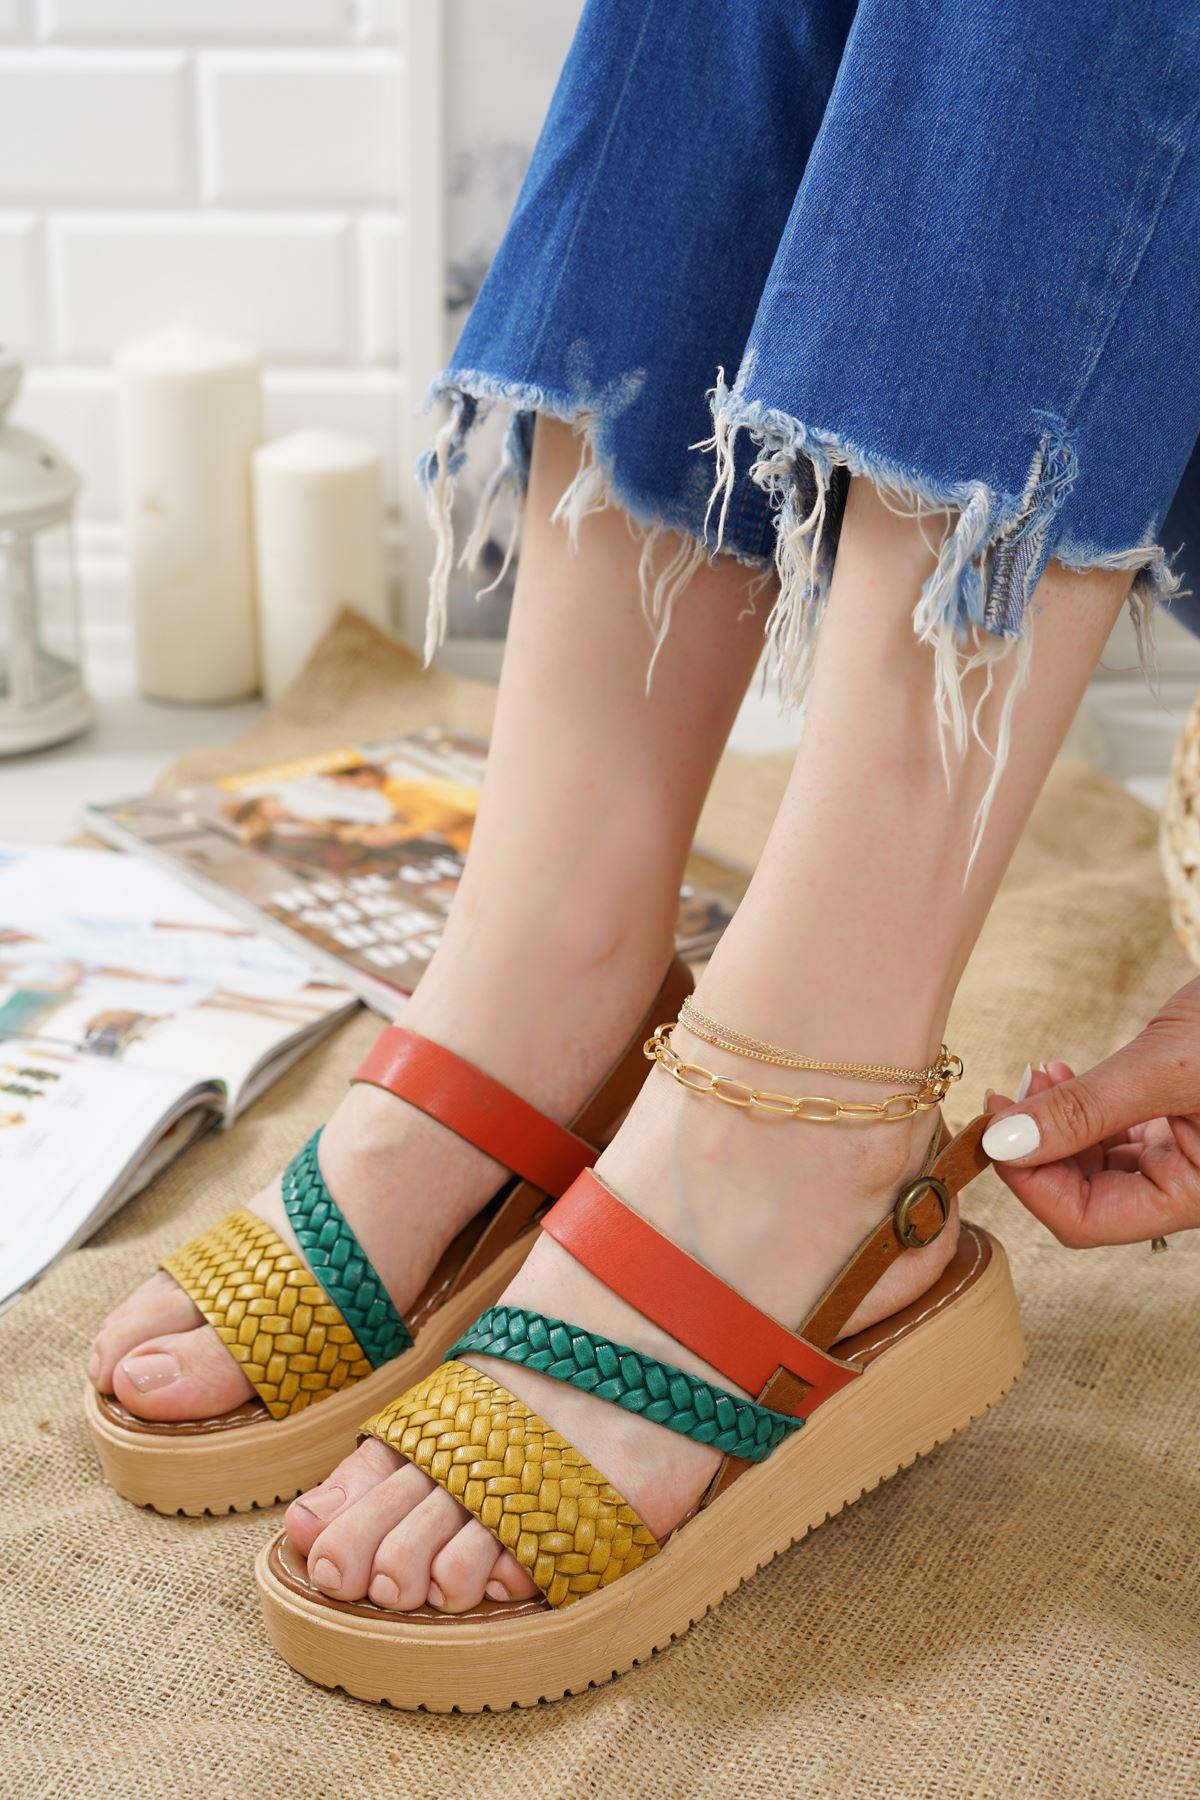 Moreno Renkli Hakiki Deri Kadın Sandalet